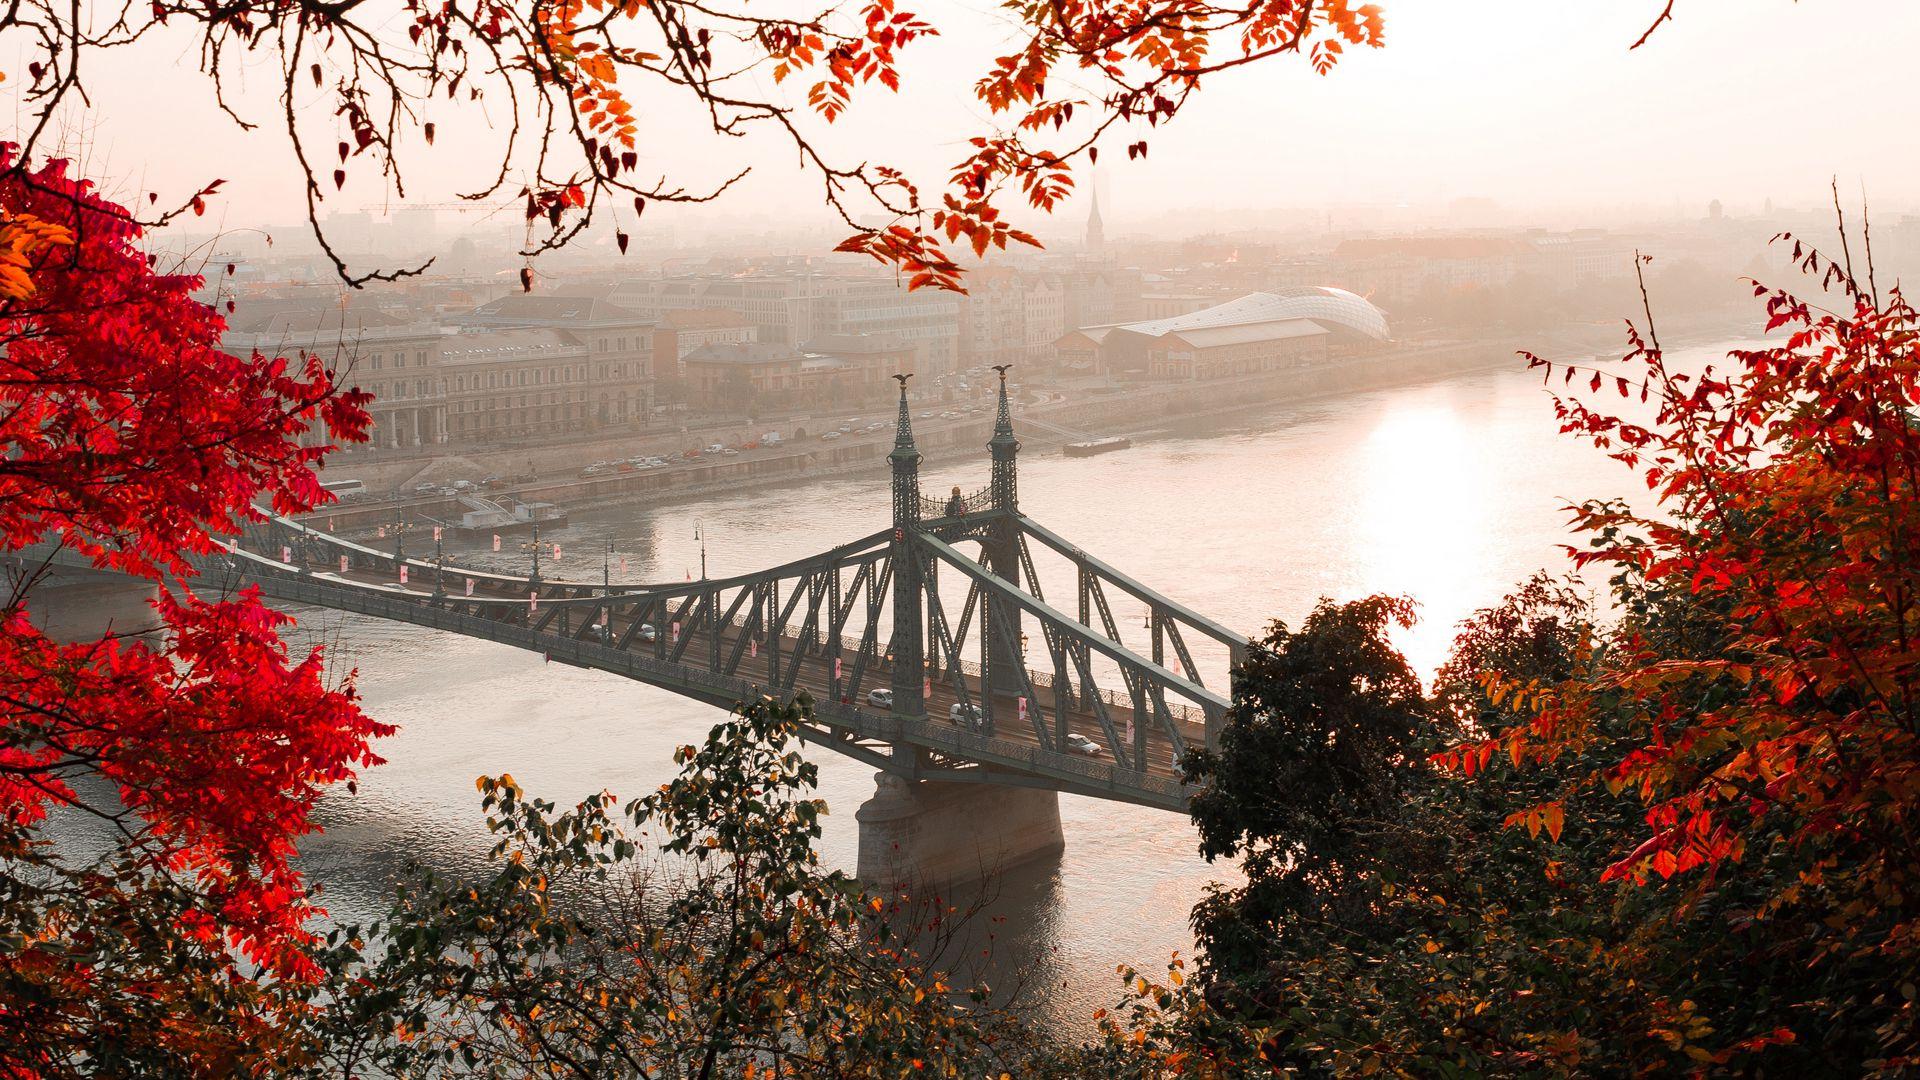 1920x1080 Wallpaper bridge, autumn, city, citadella, budapest, hungary